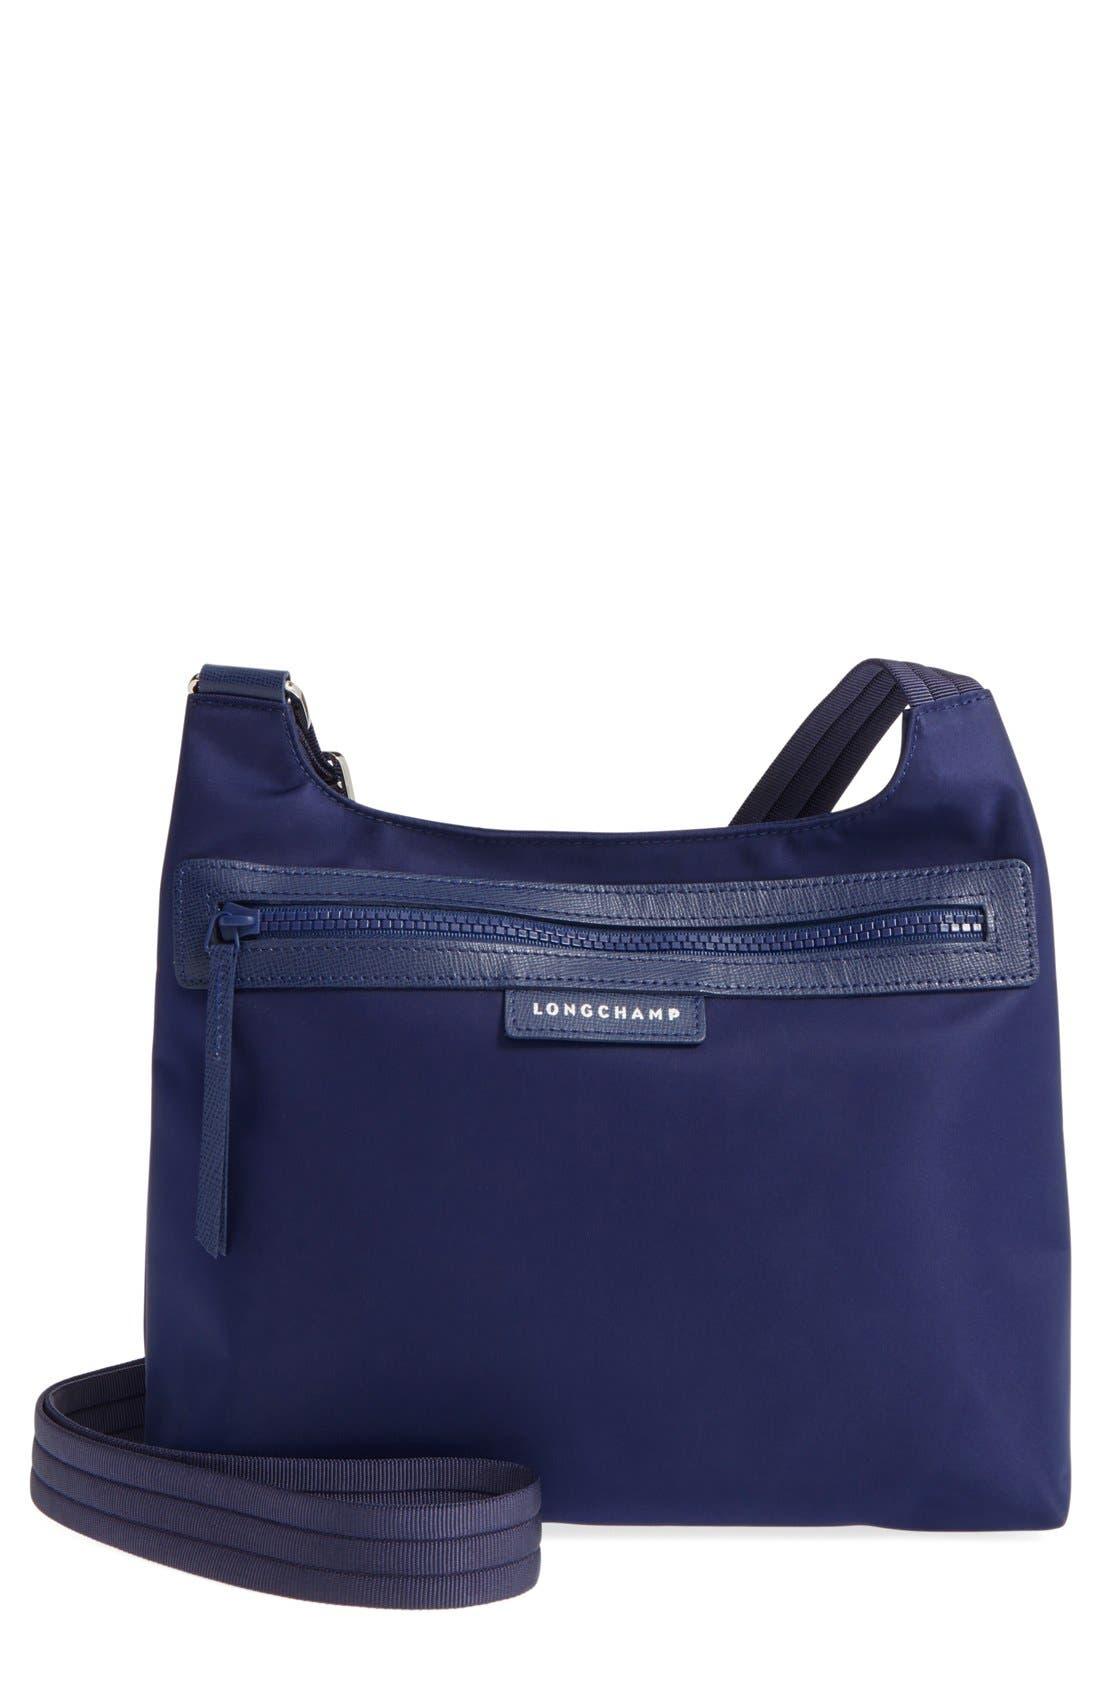 Longchamp 'Le Pliage Neo' Nylon Crossbody Bag